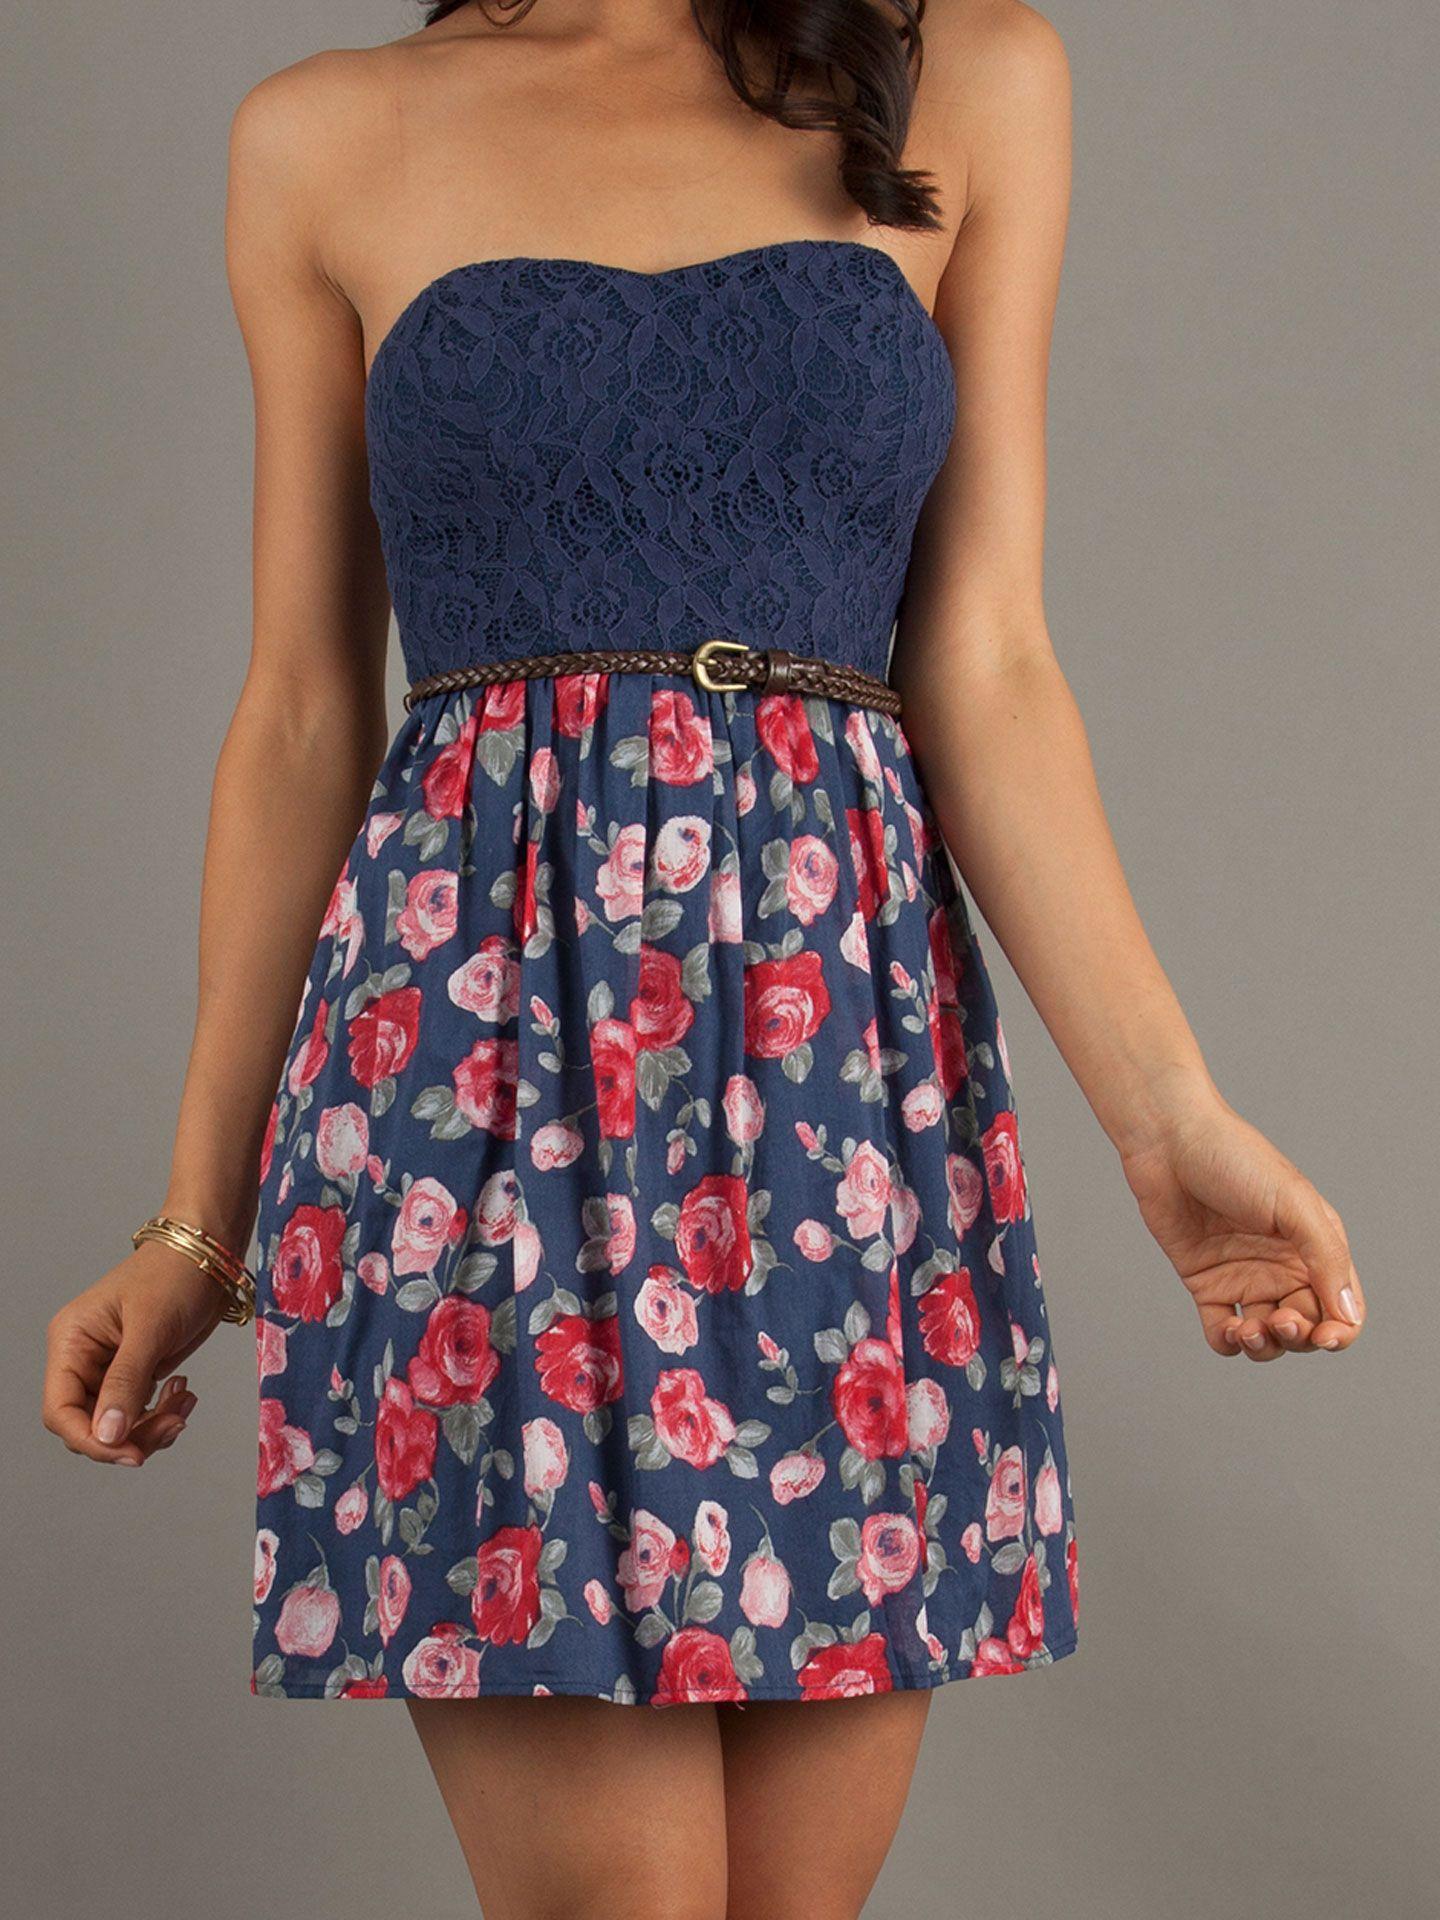 50 Summer Dresses (Under $50!) | Clothes | Dresses, Summer ...